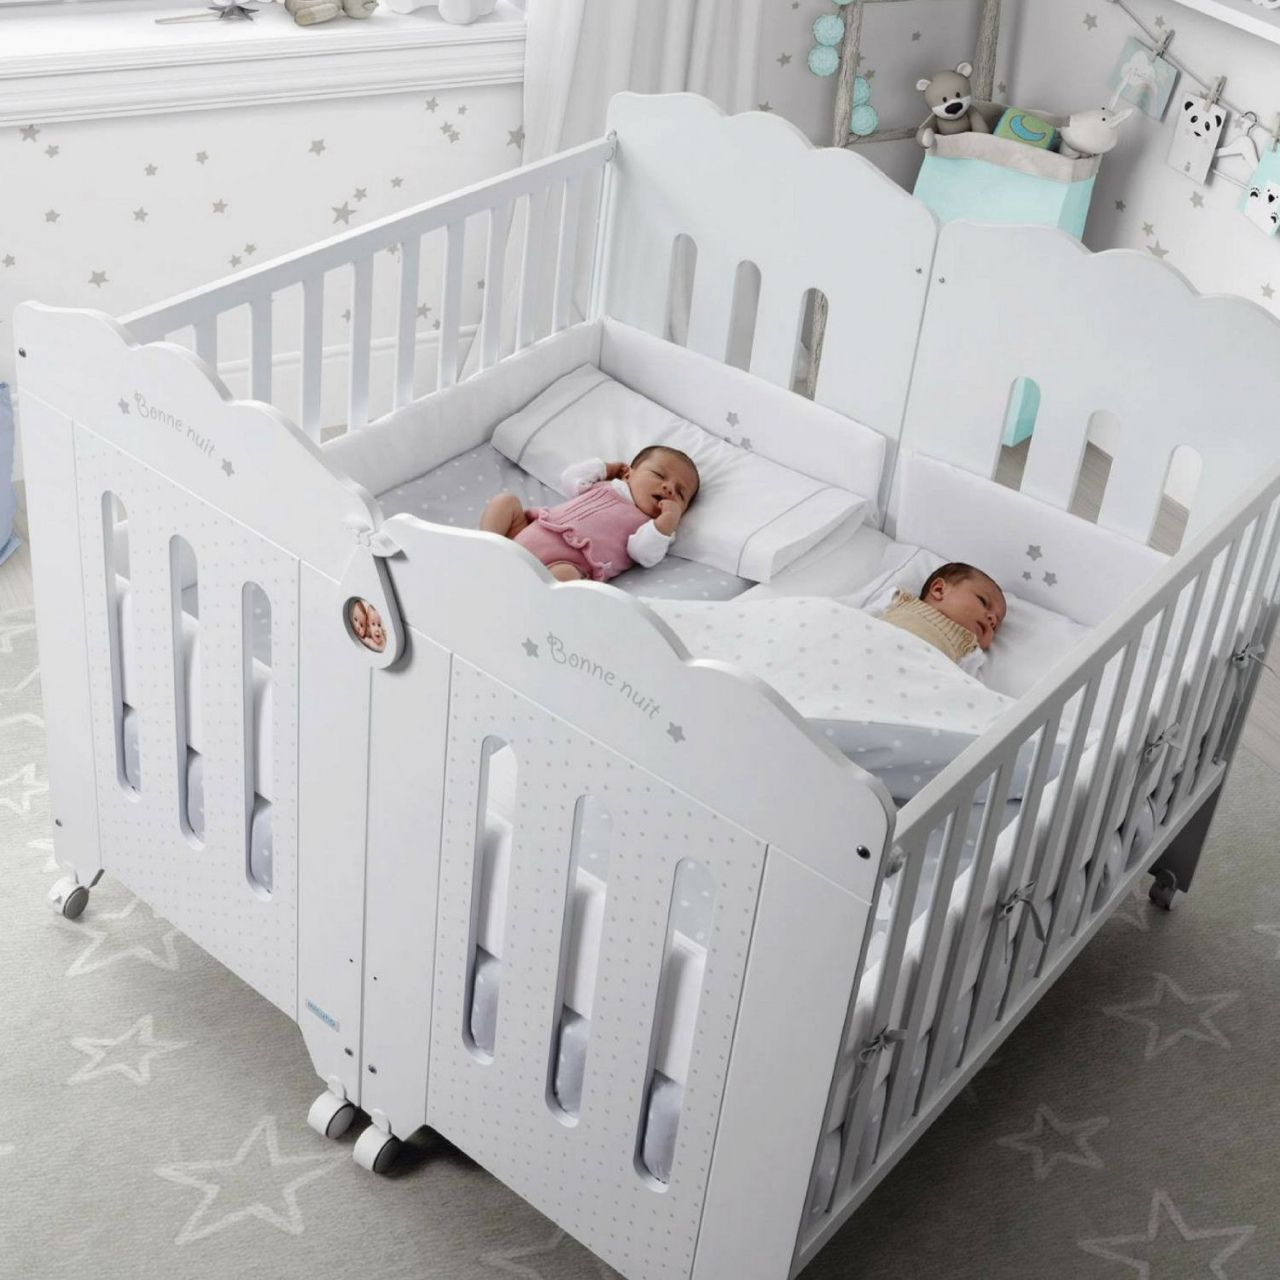 77 Lit Superposé Le Bon Coin Mai 2018 | Twin Baby Rooms intérieur Lit Superpose Le Bon Coin